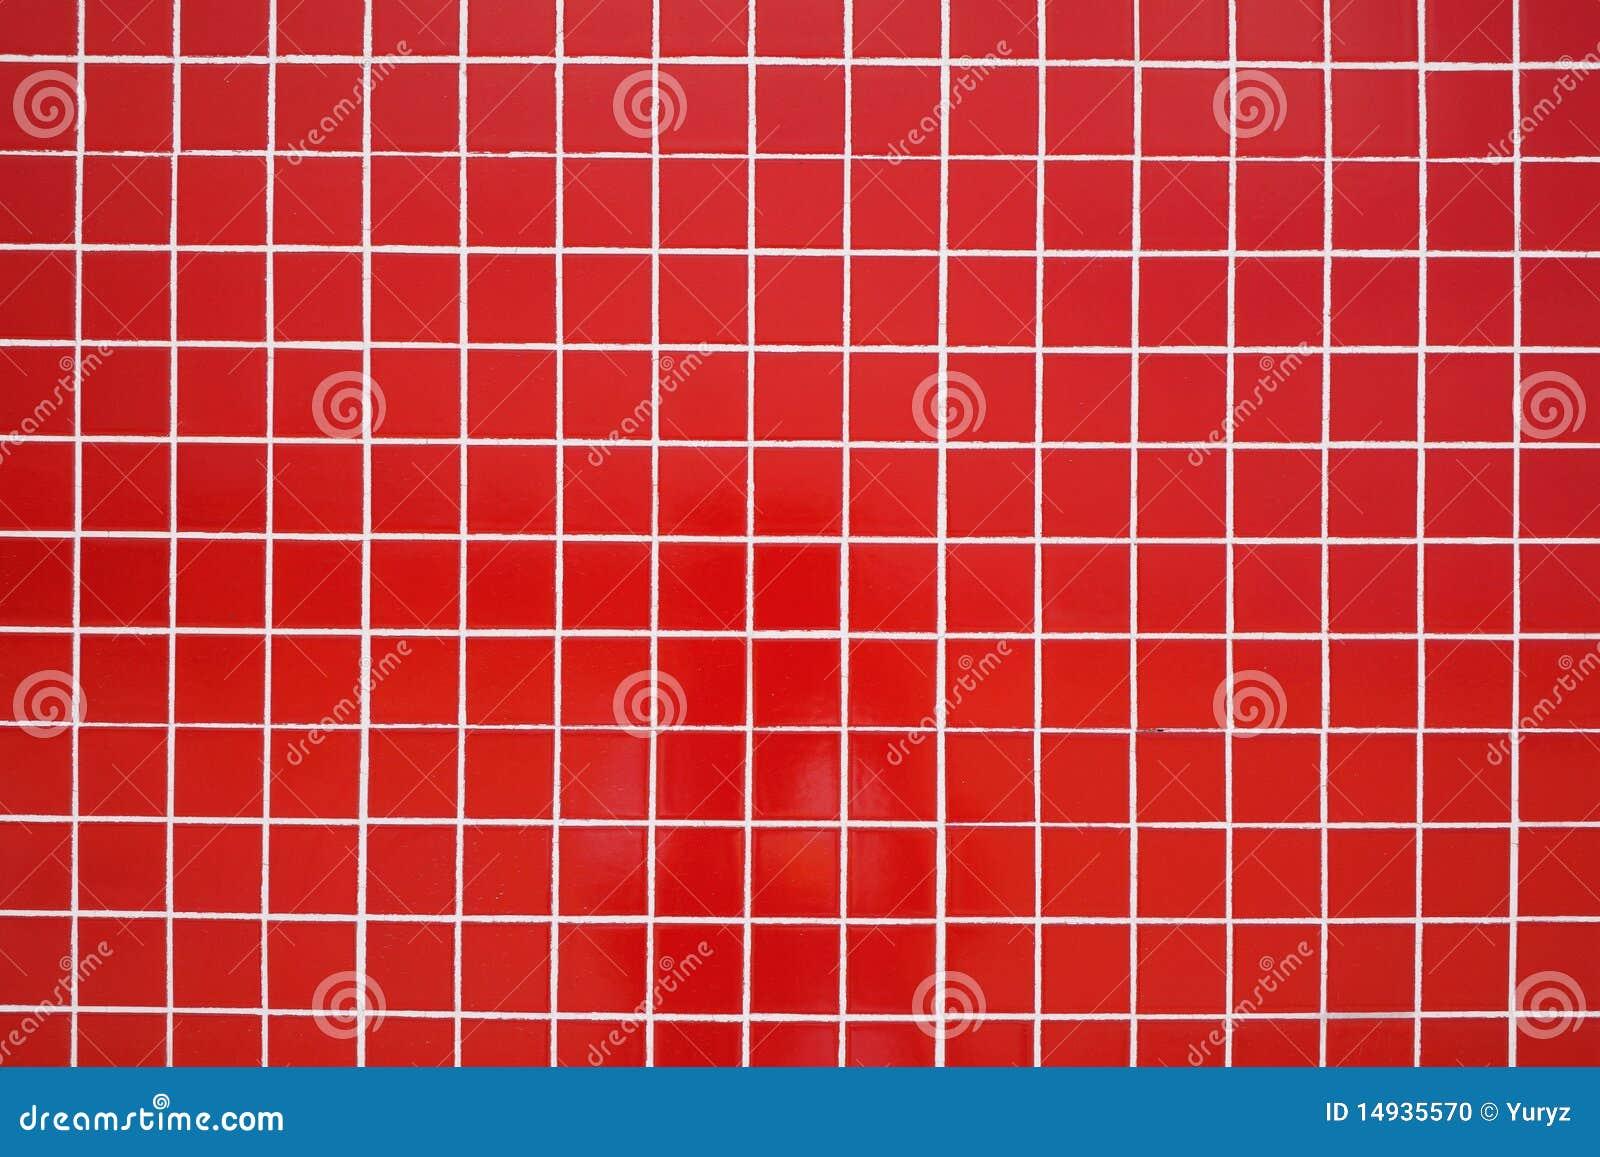 Red Ceramic Tile Stock Photo Image 14935570